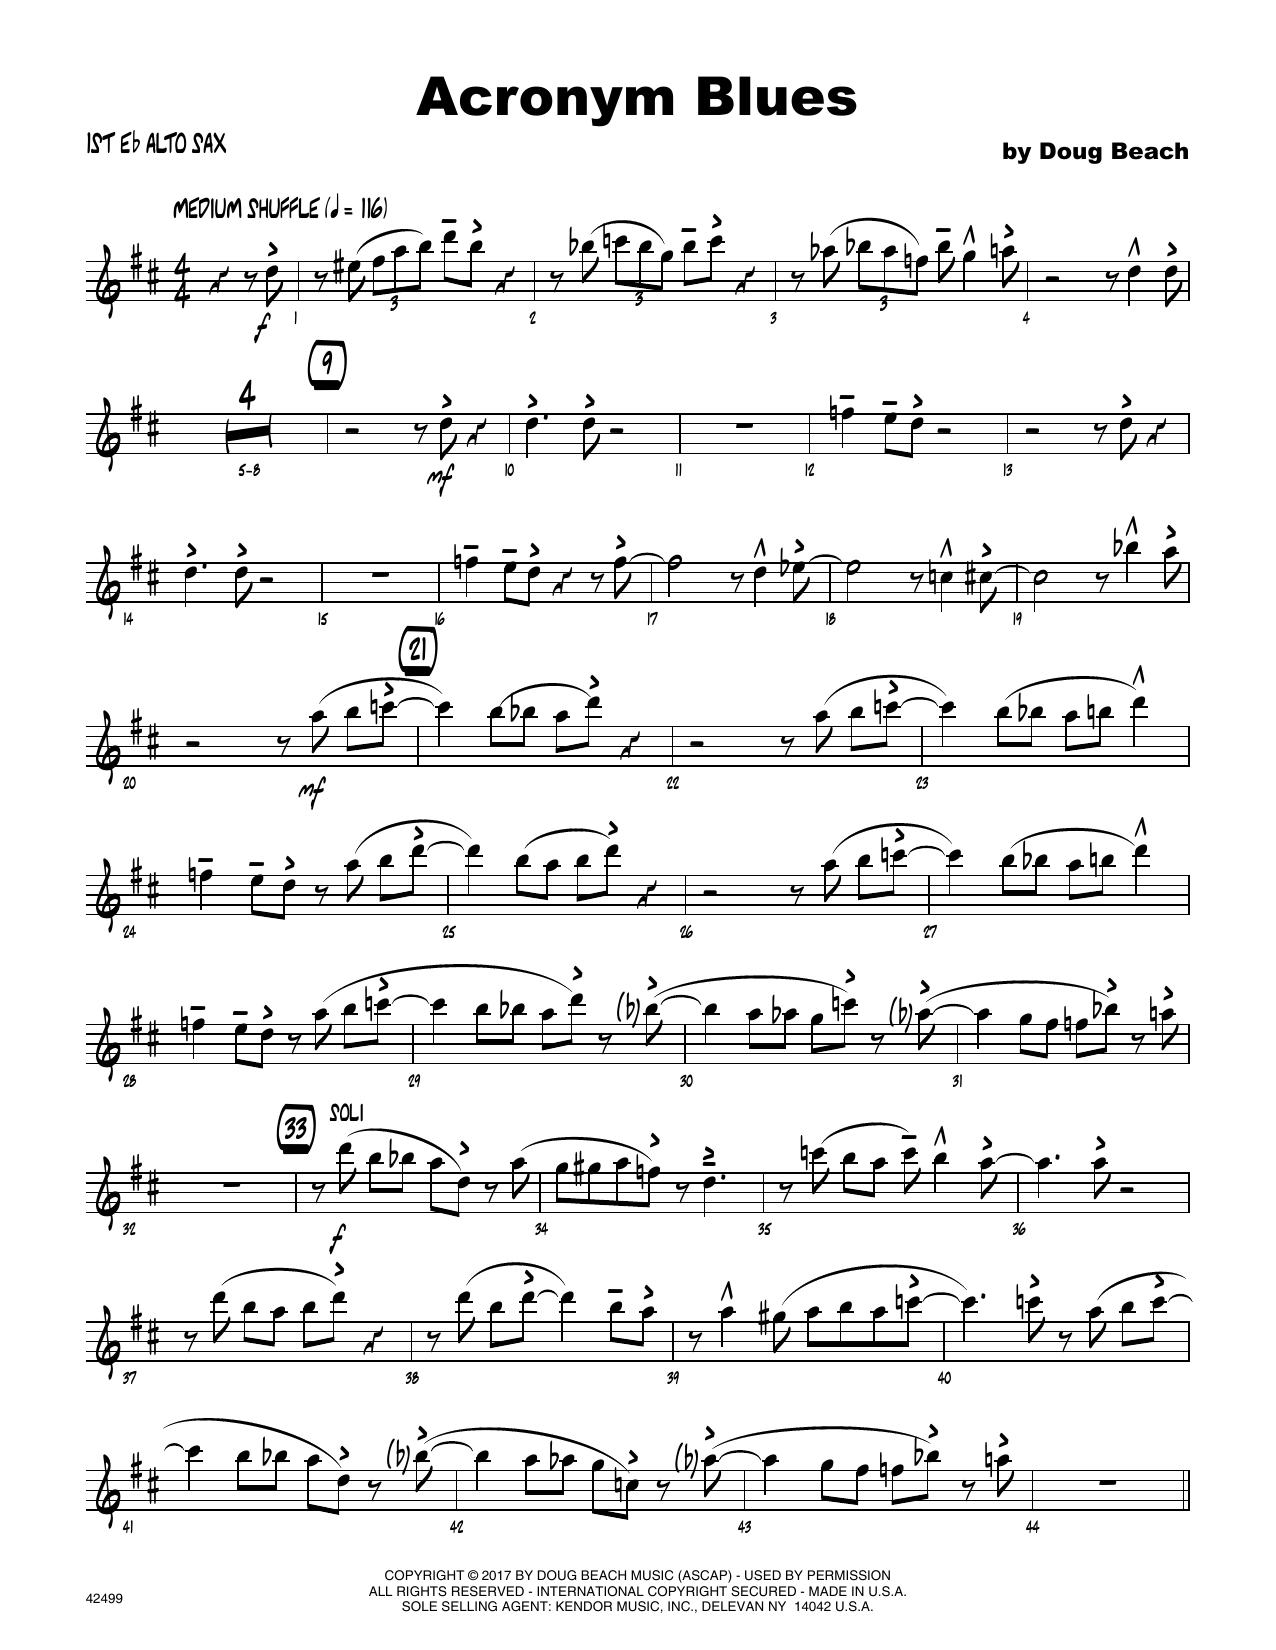 Acronym Blues - 1st Eb Alto Saxophone at Stanton's Sheet Music